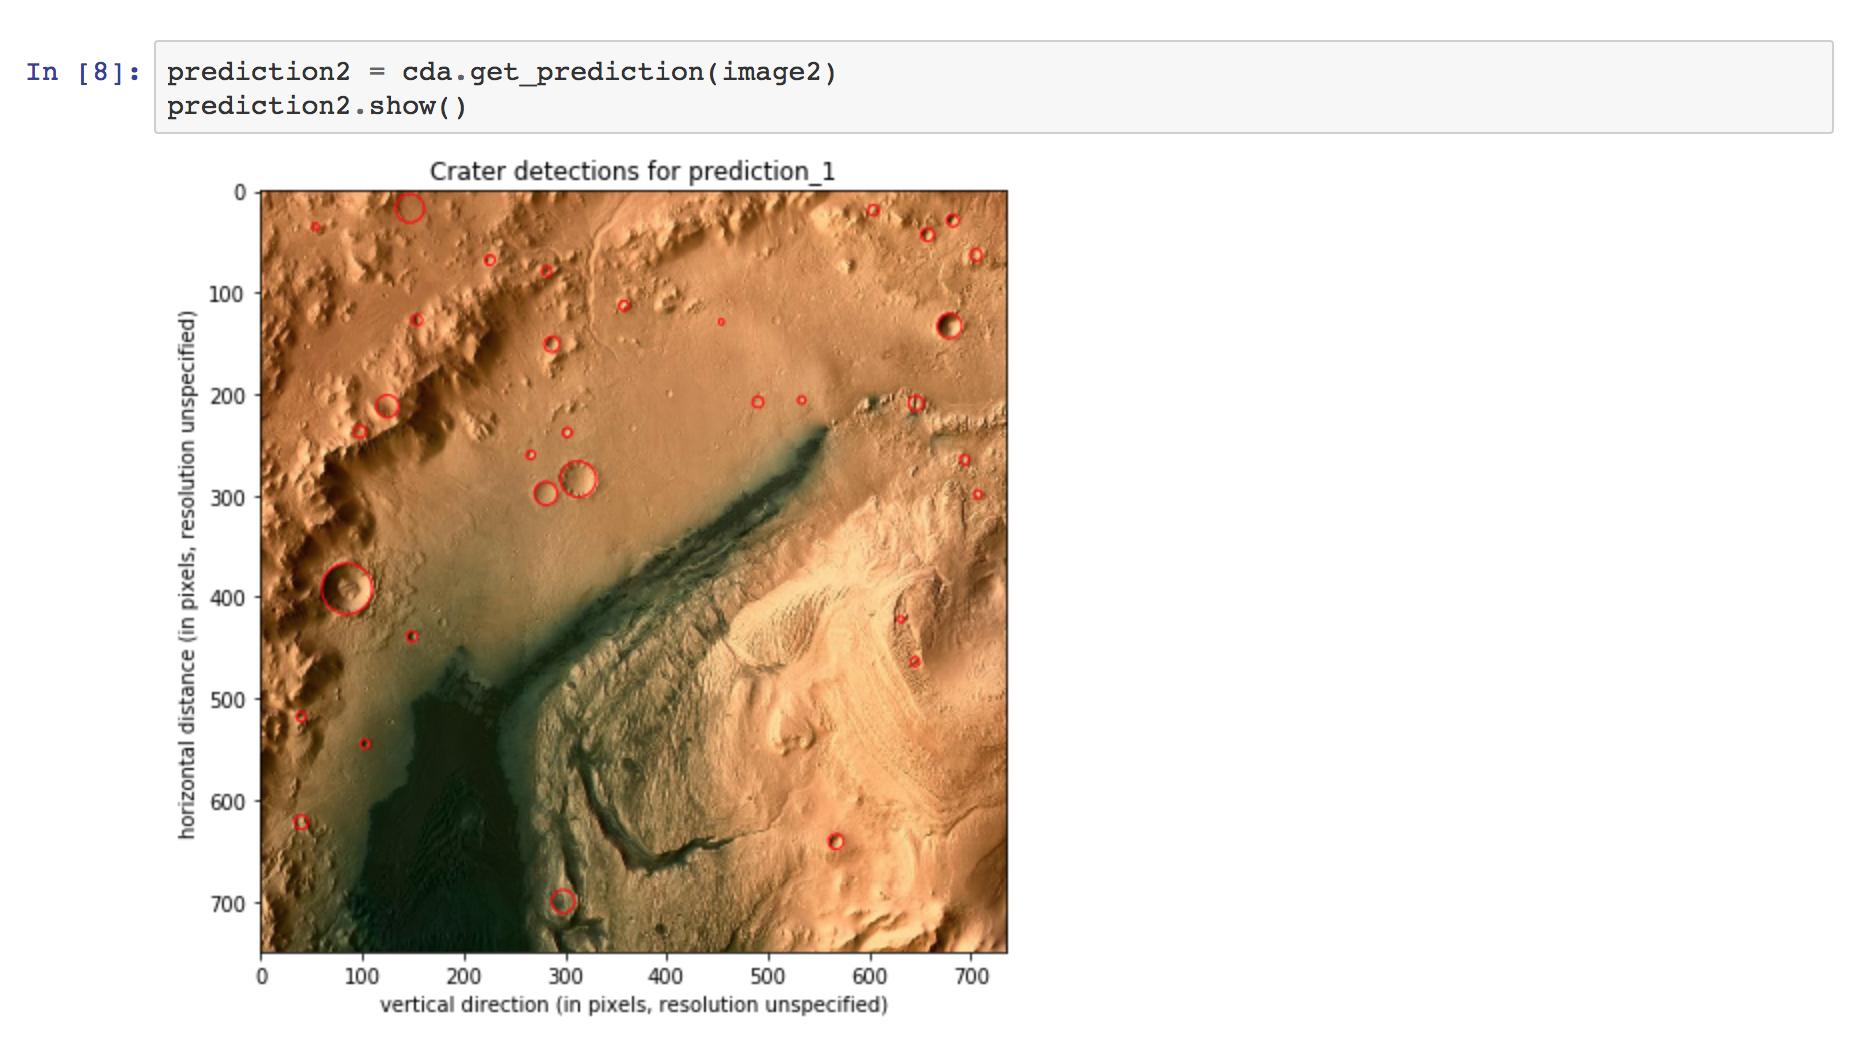 Mars image 2